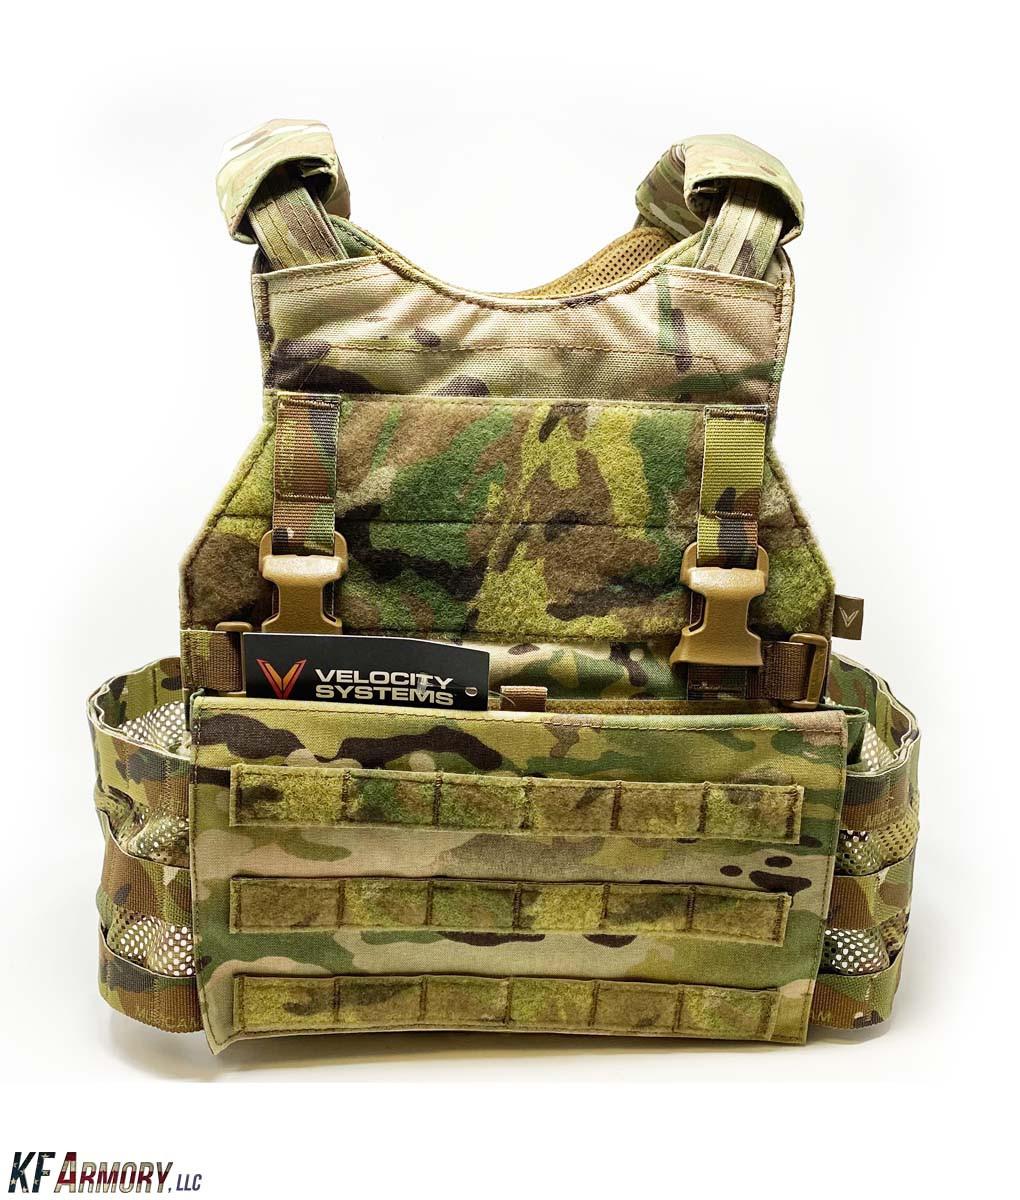 Velocity Systems Scarab Lt Full Kit Kf Armory Llc